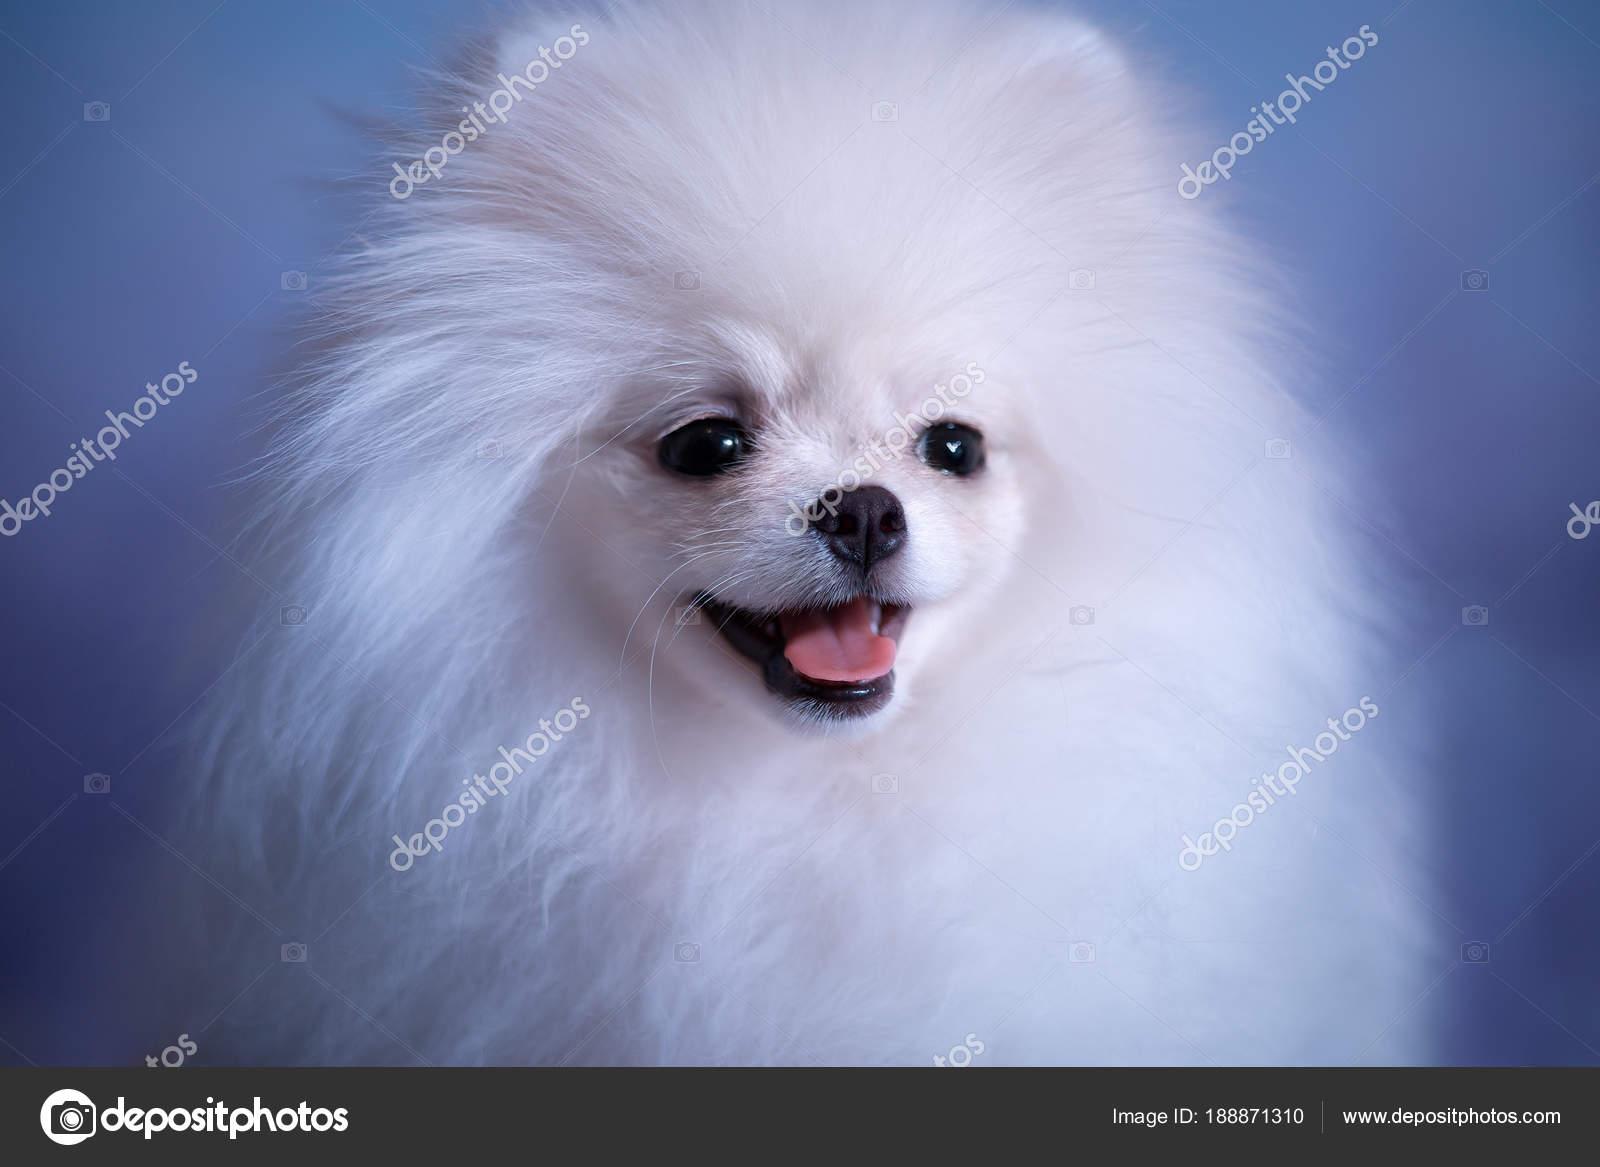 Cute White Fluffy Puppy Stock Photo C Fotolit2 188871310